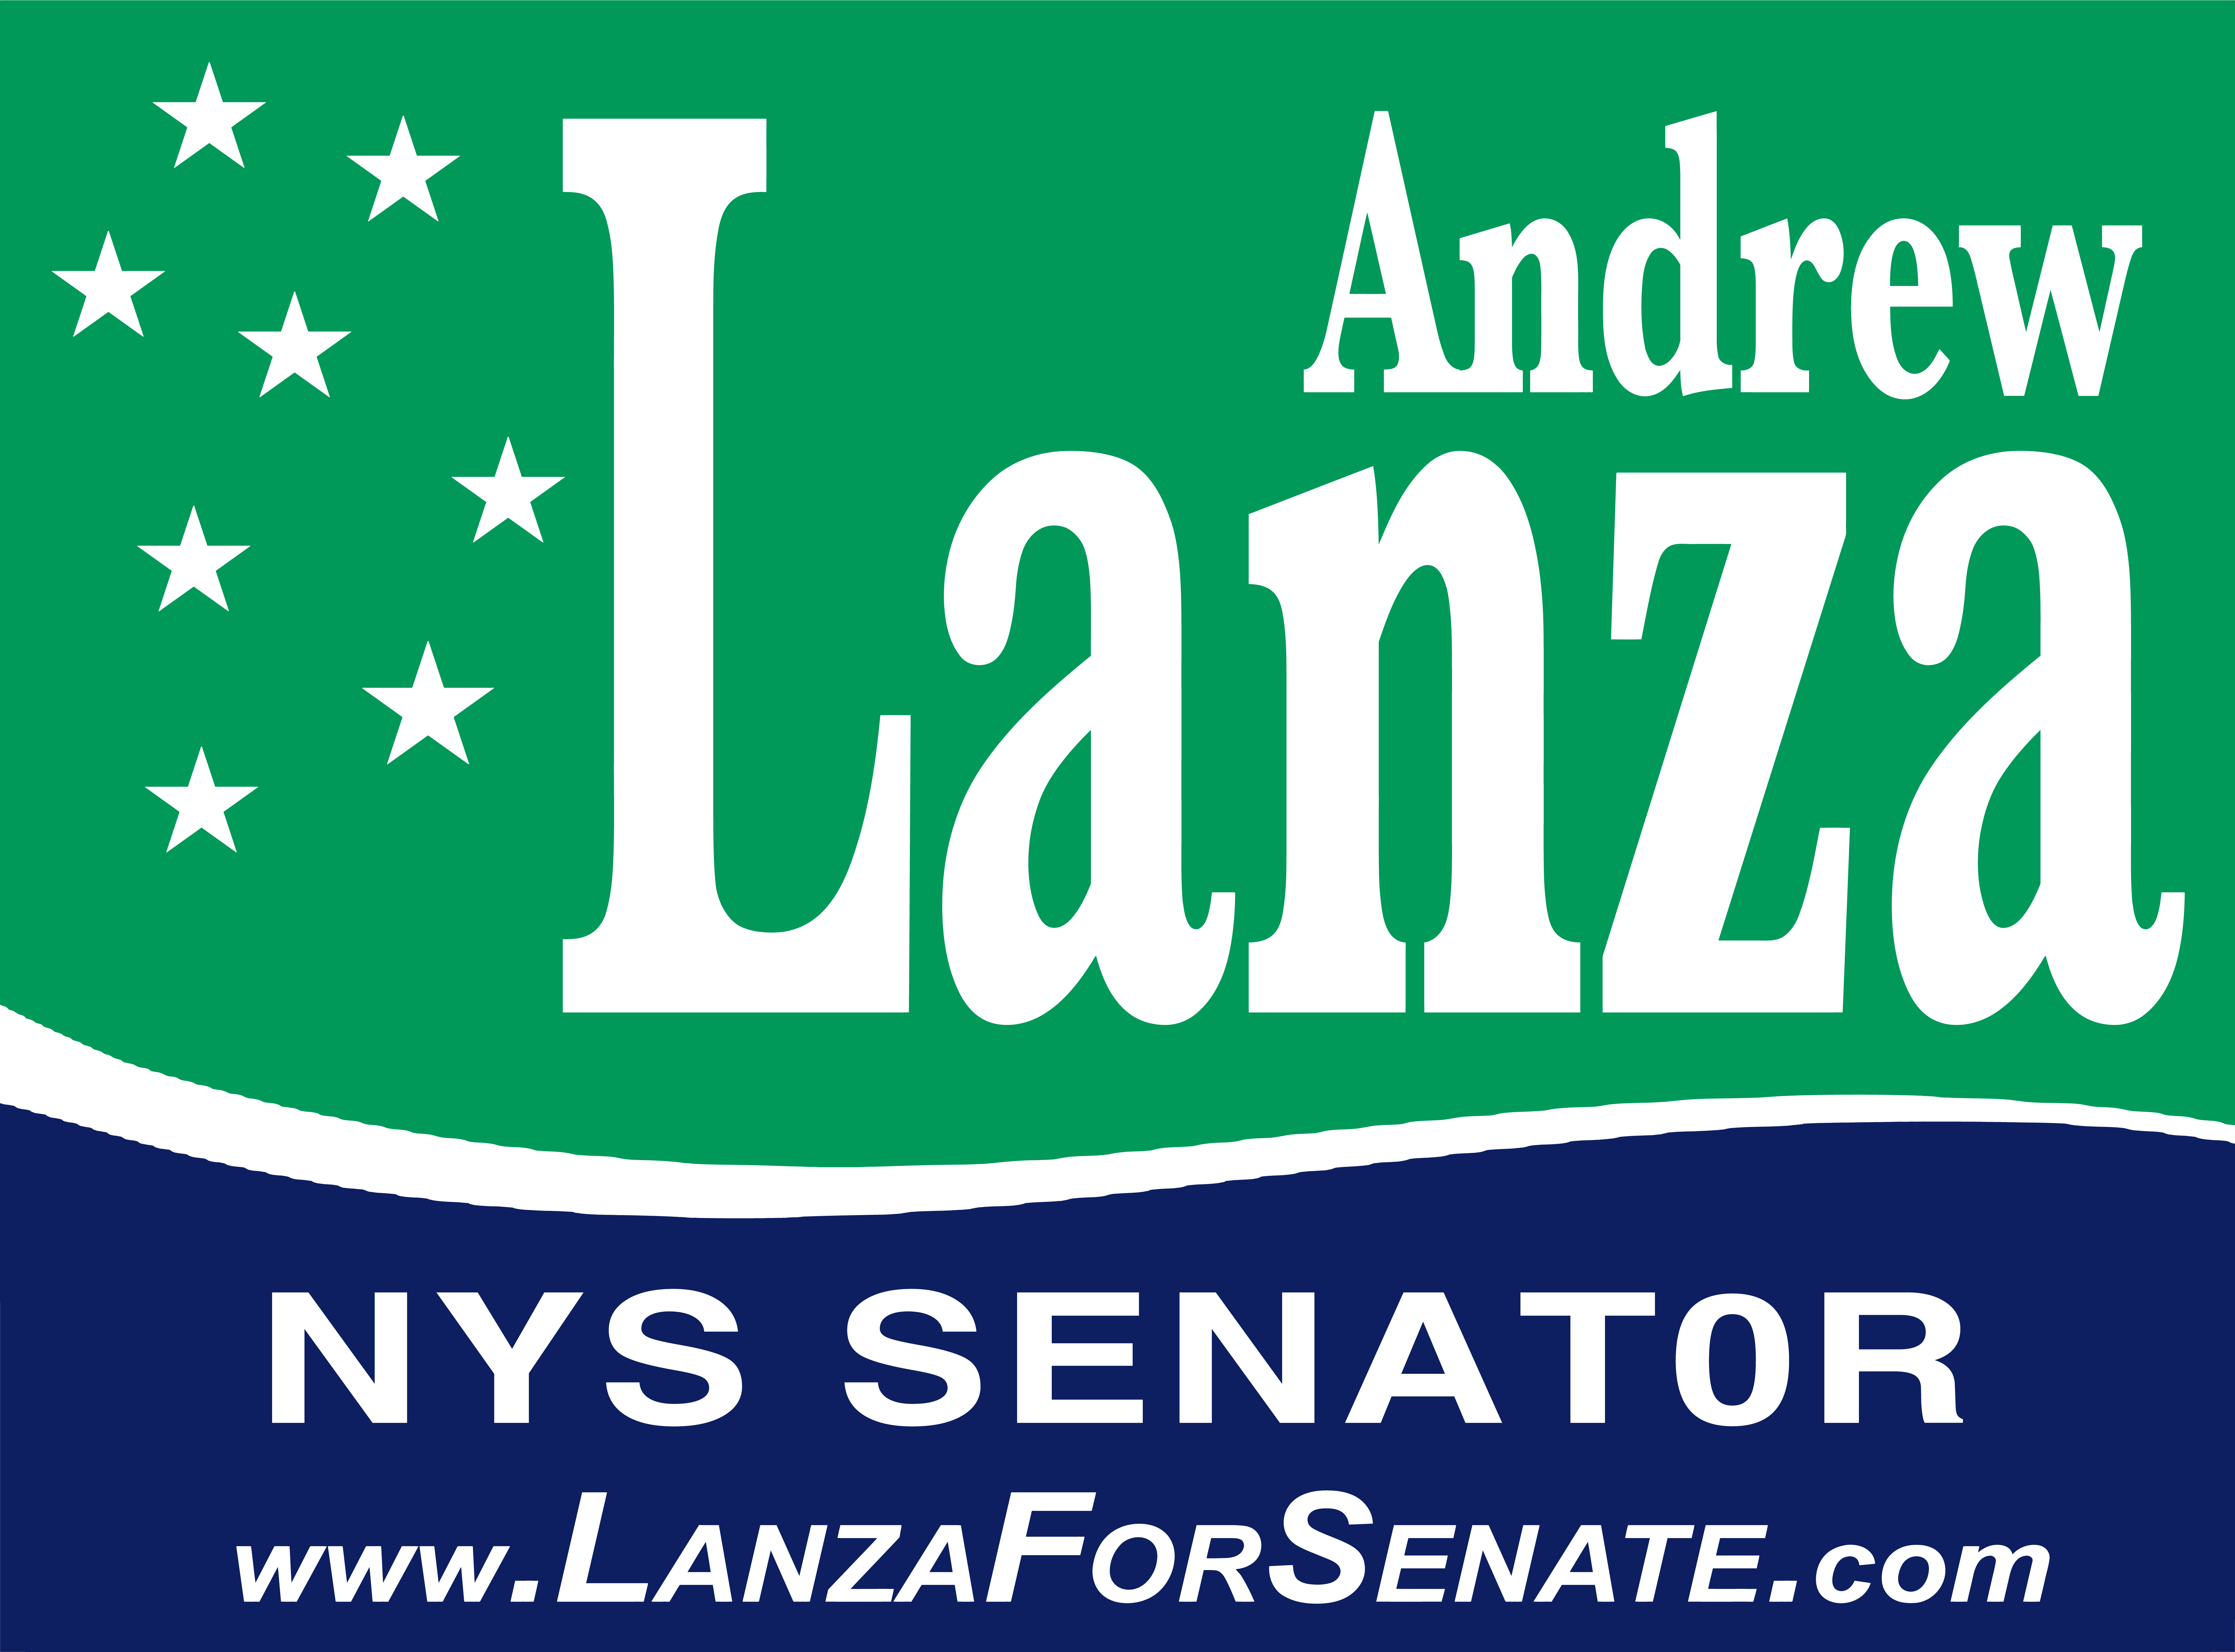 Lanza_Lawn_Signs_Green-Blue.jpg